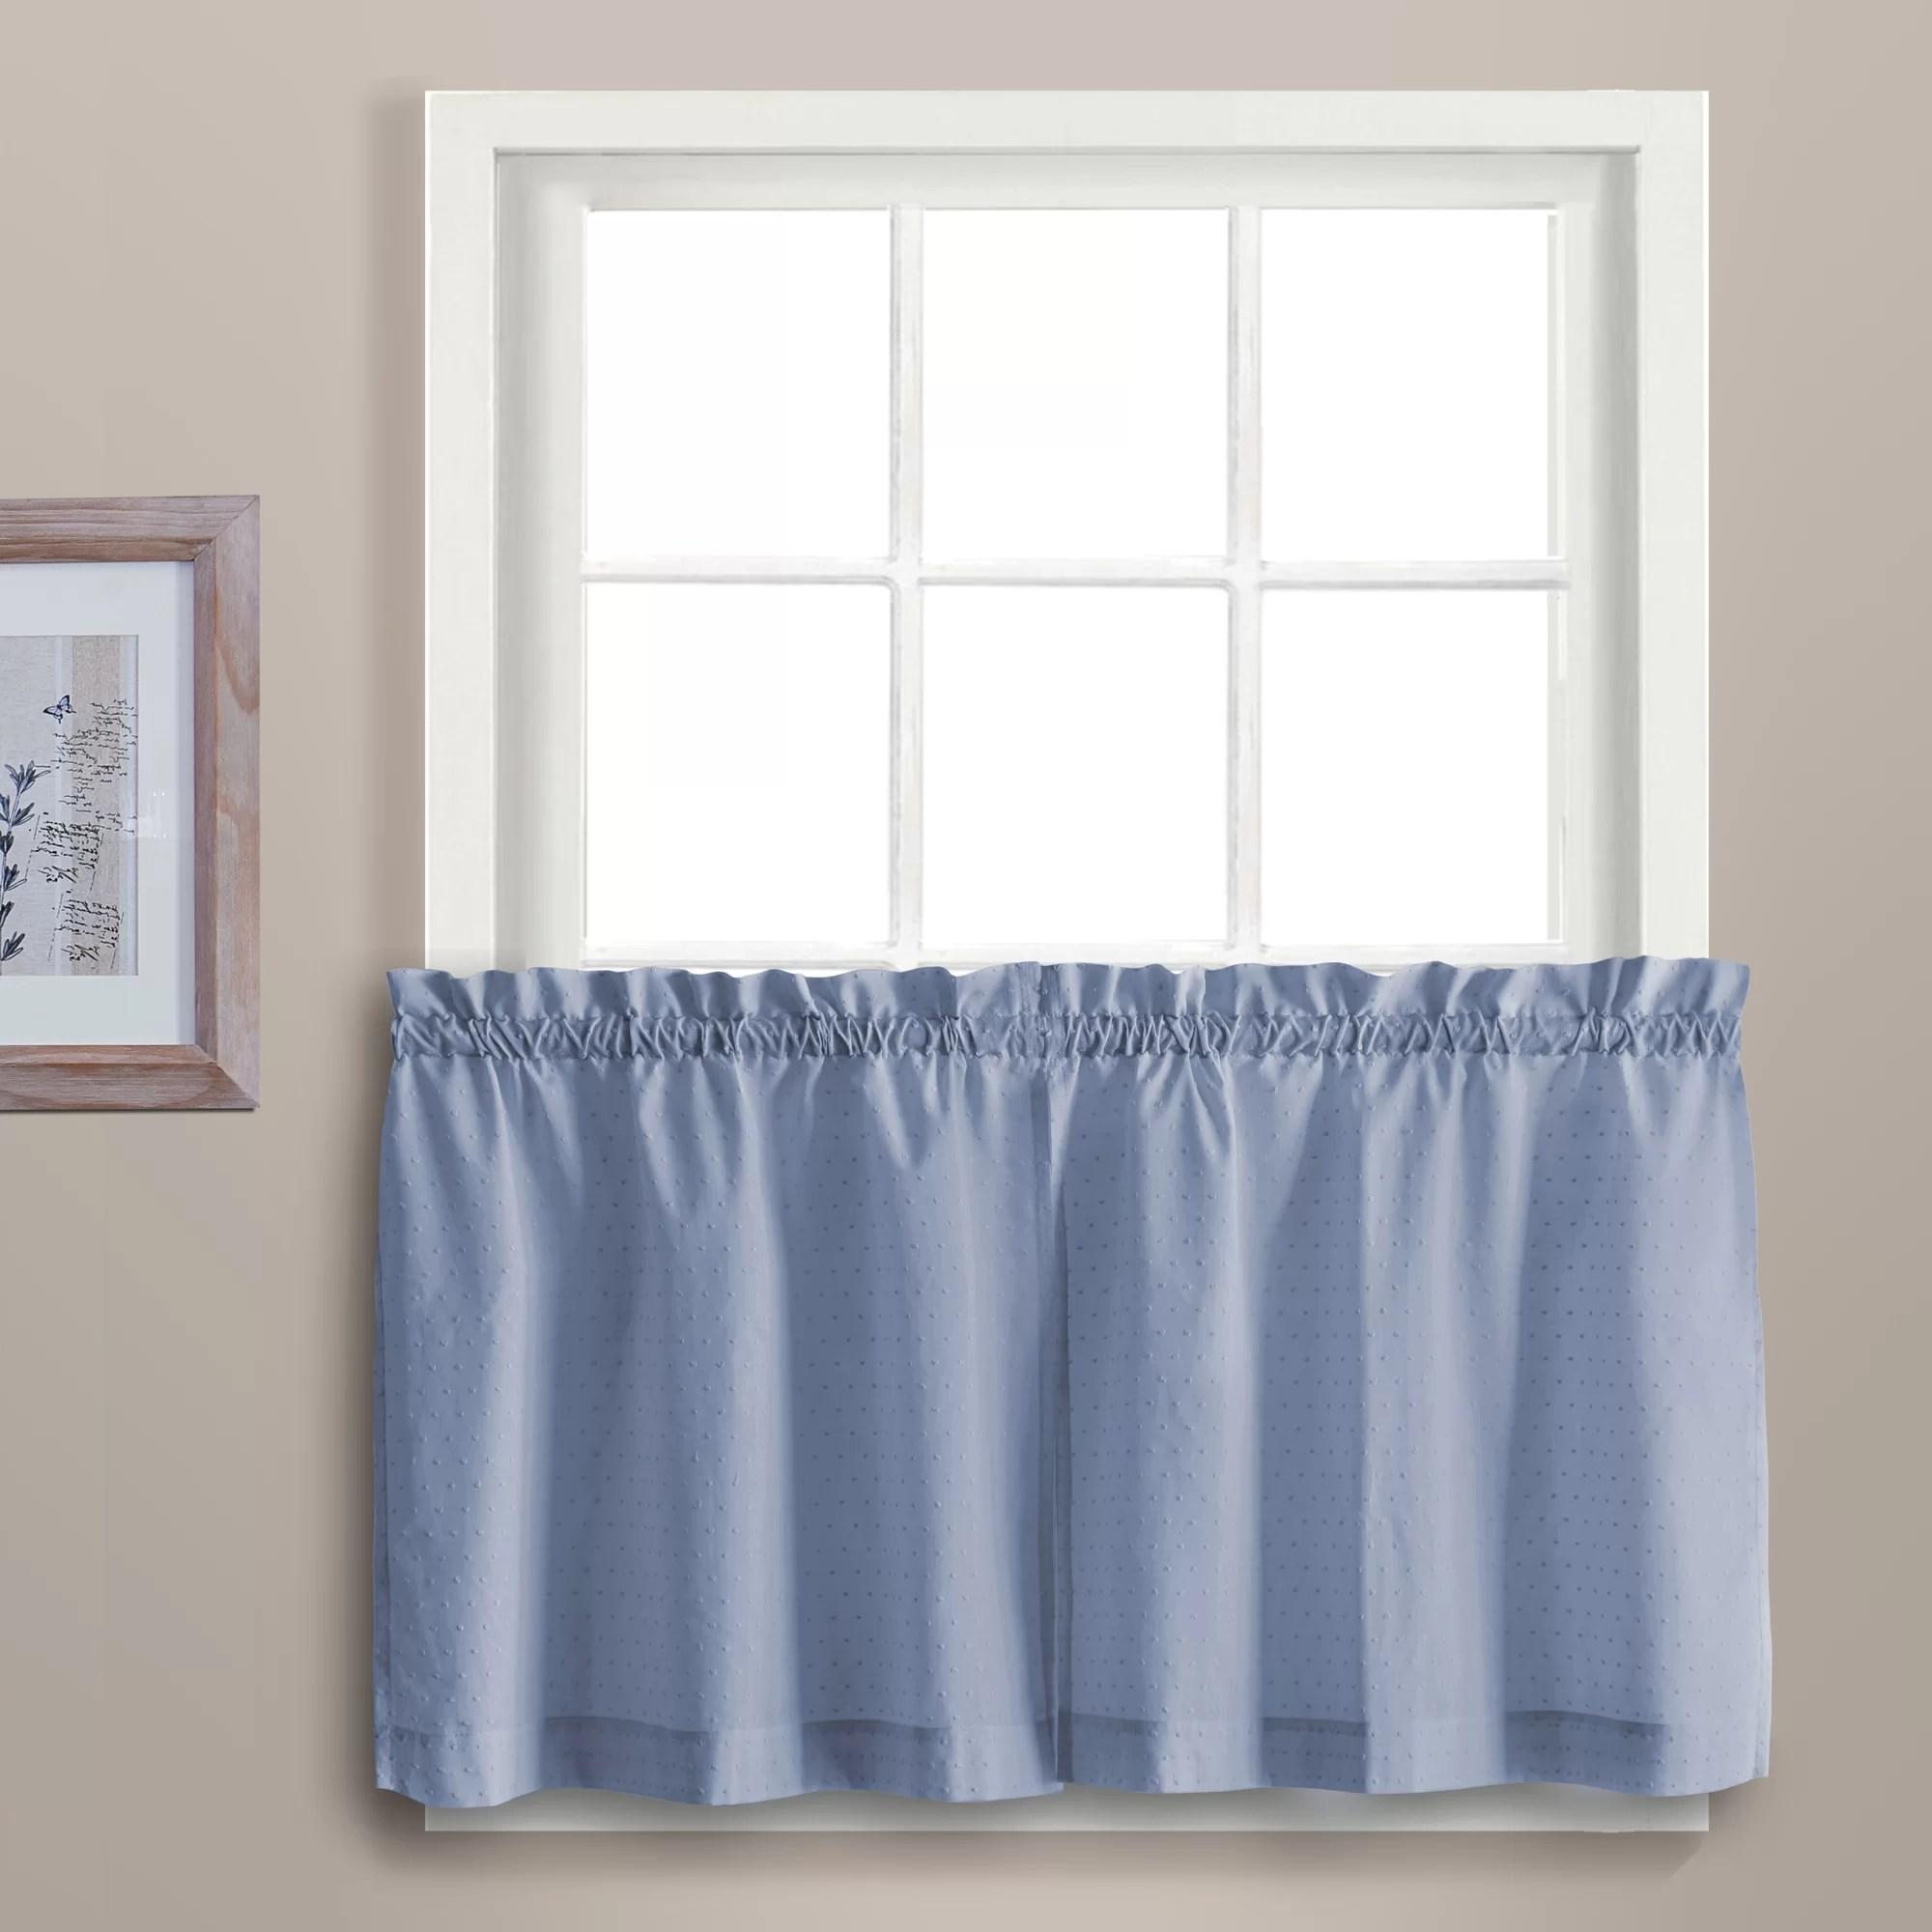 kitchen tier curtains pass through window united curtain co dorothy ebay